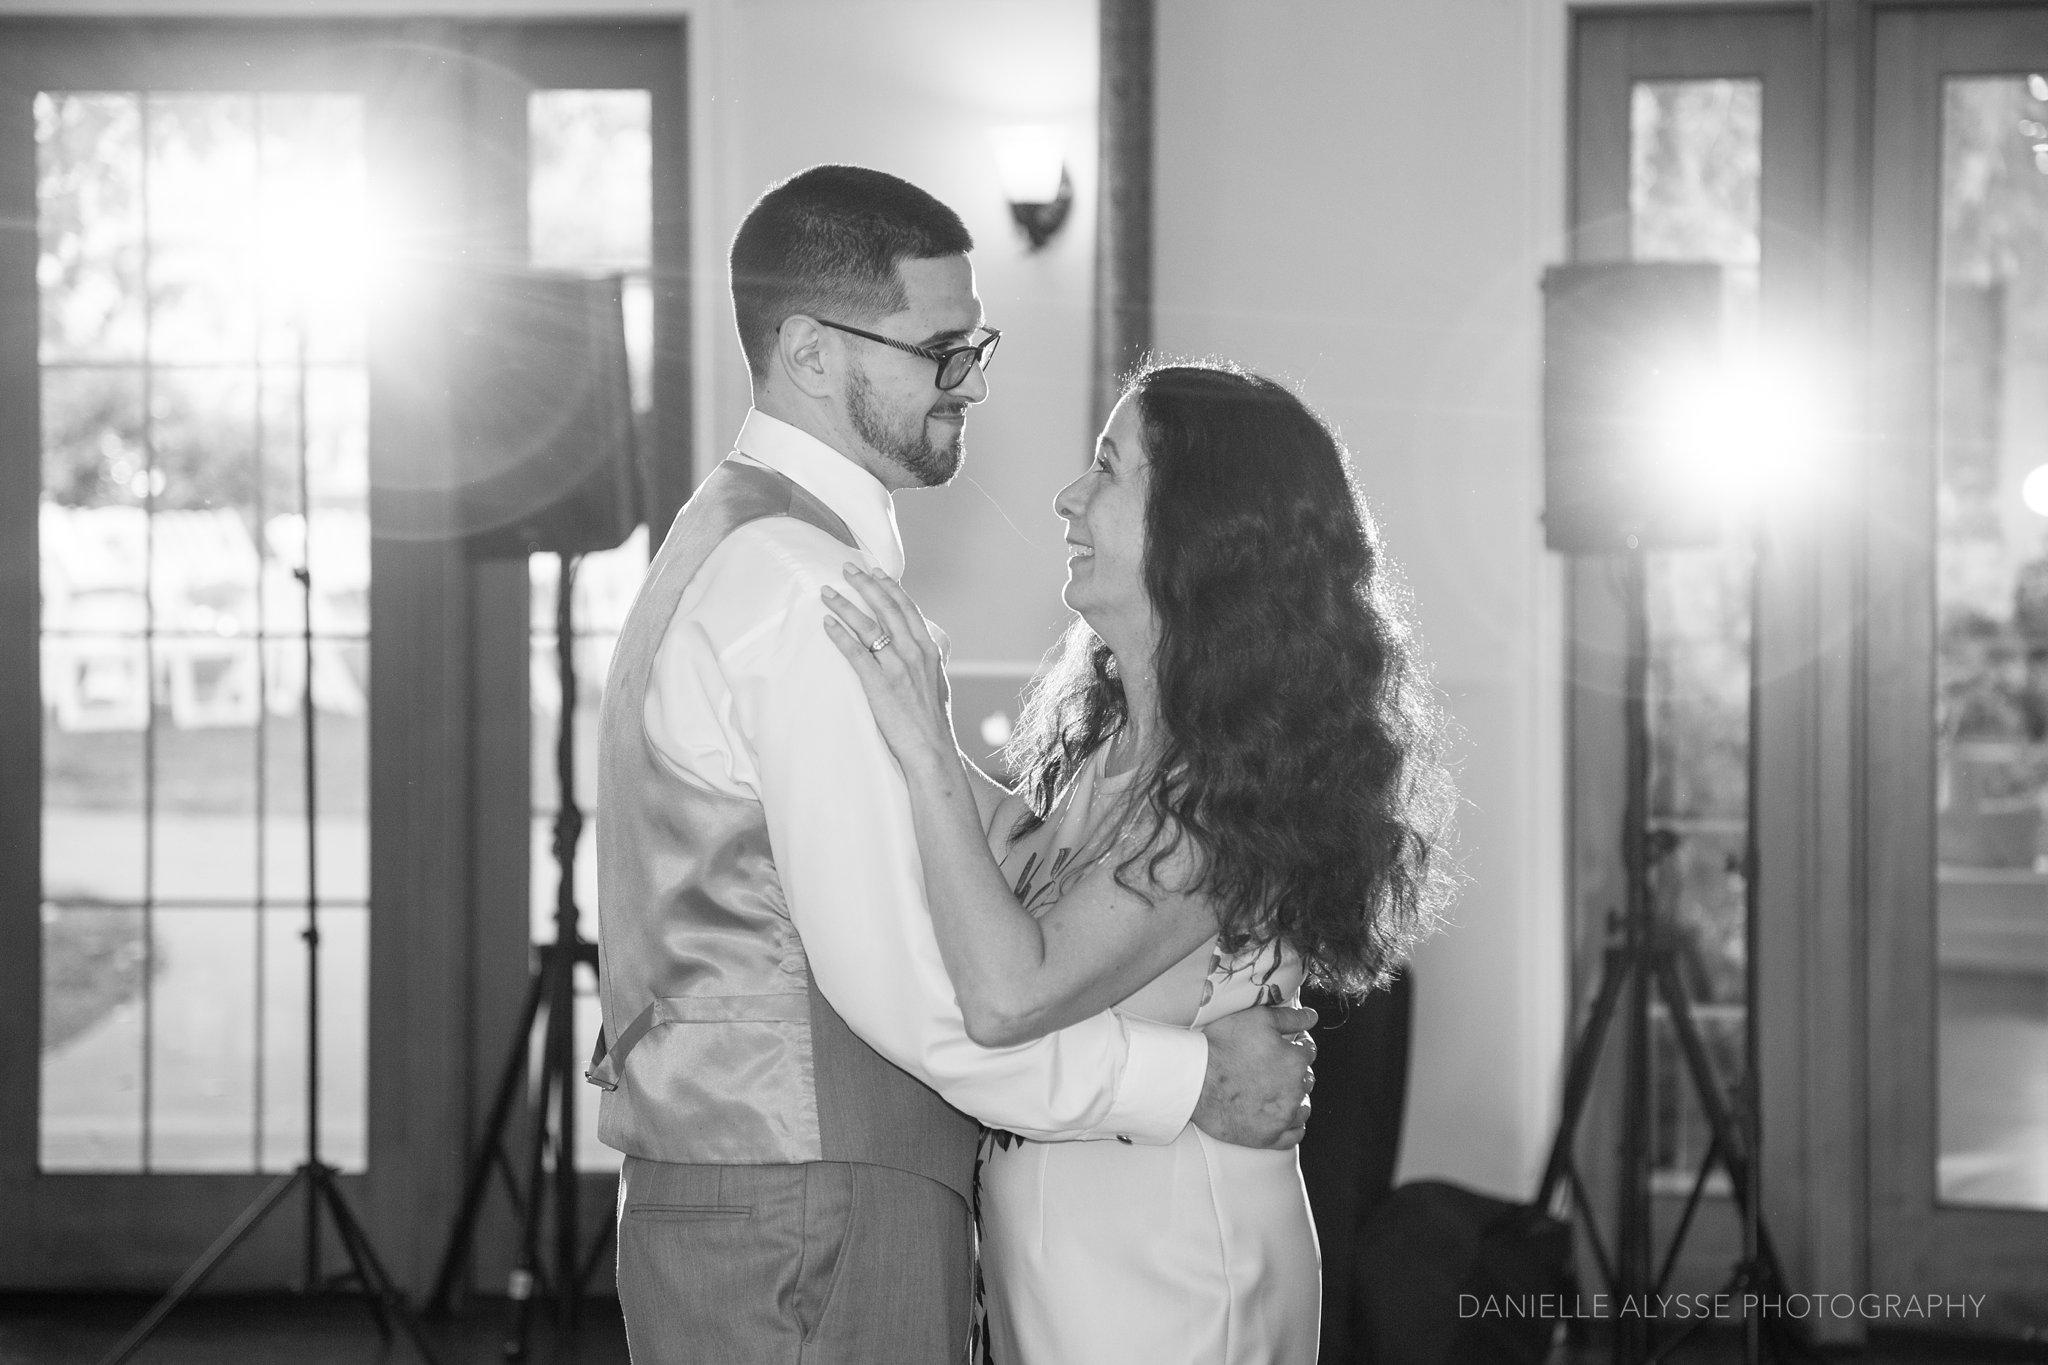 170507_blog_megan_david_wedding_loomis_flower_farm_inn_danielle_alysse_photography_sacramento_photographer0469_WEB.jpg